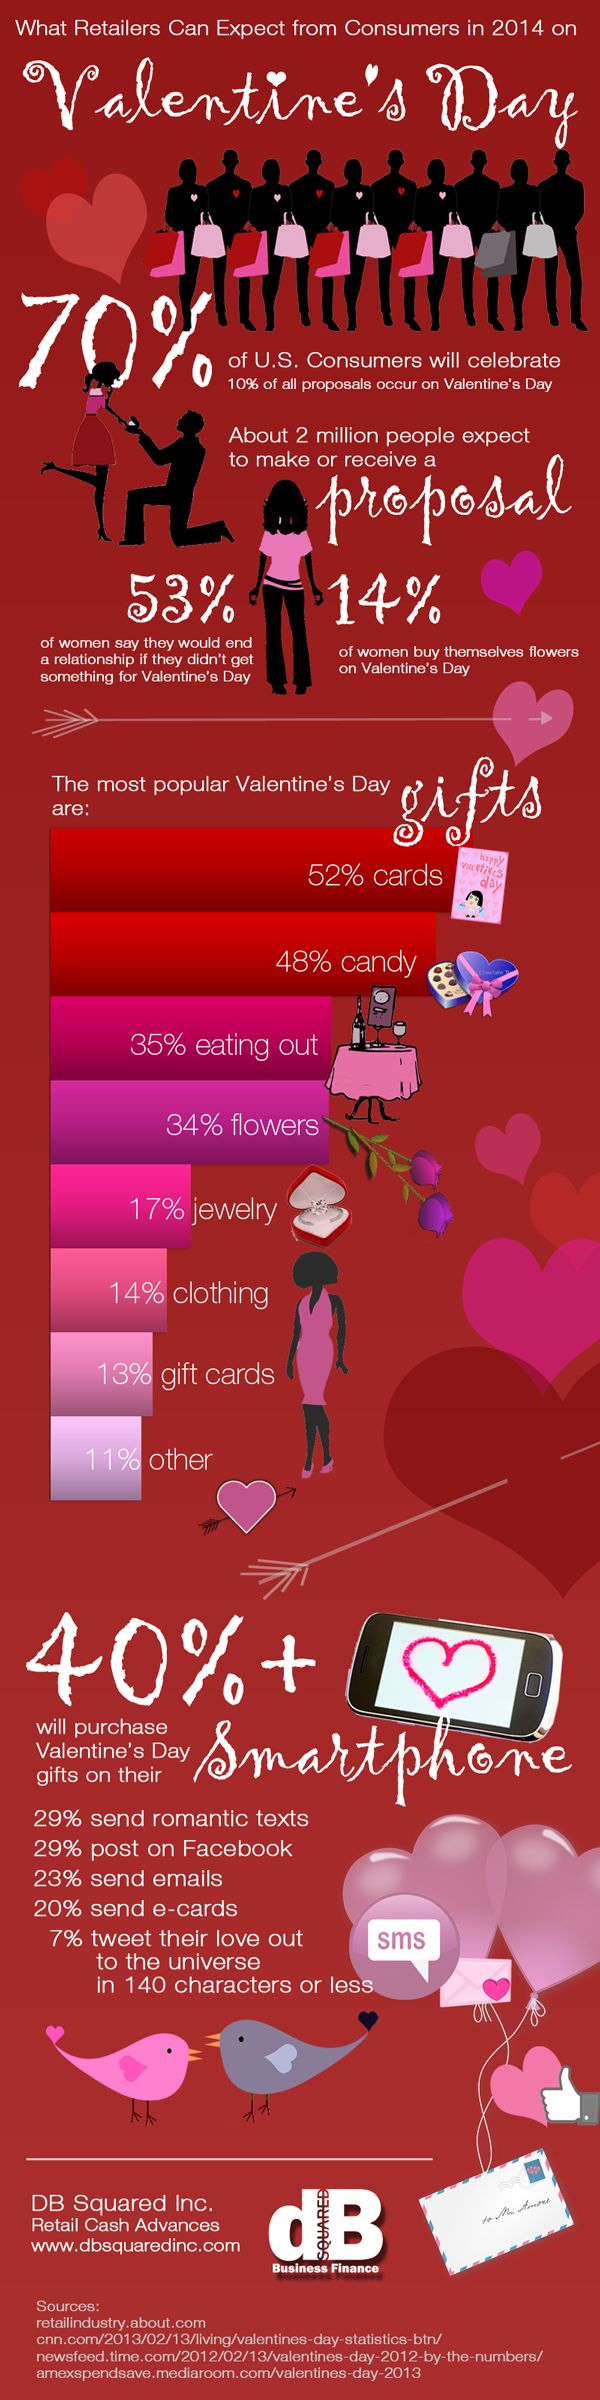 valentine's day marketing sayings